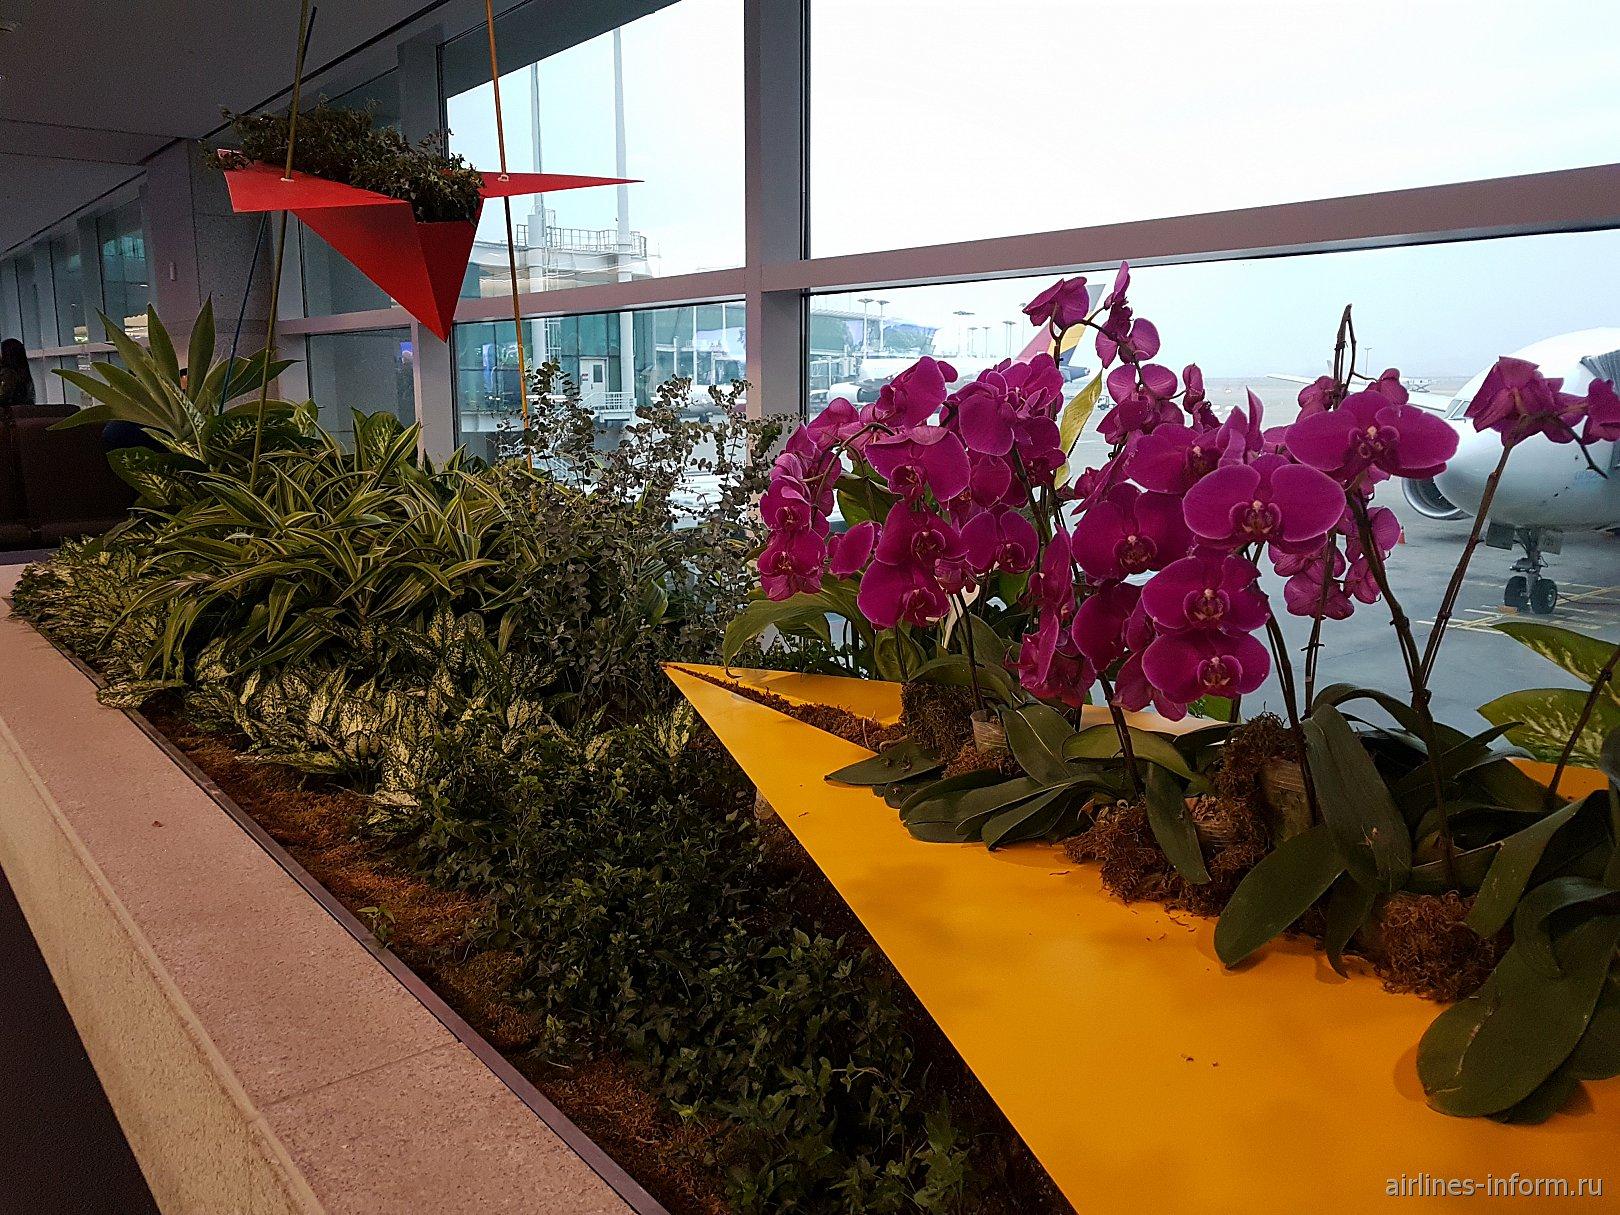 Цветы в аэропорту Сеул Инчхон